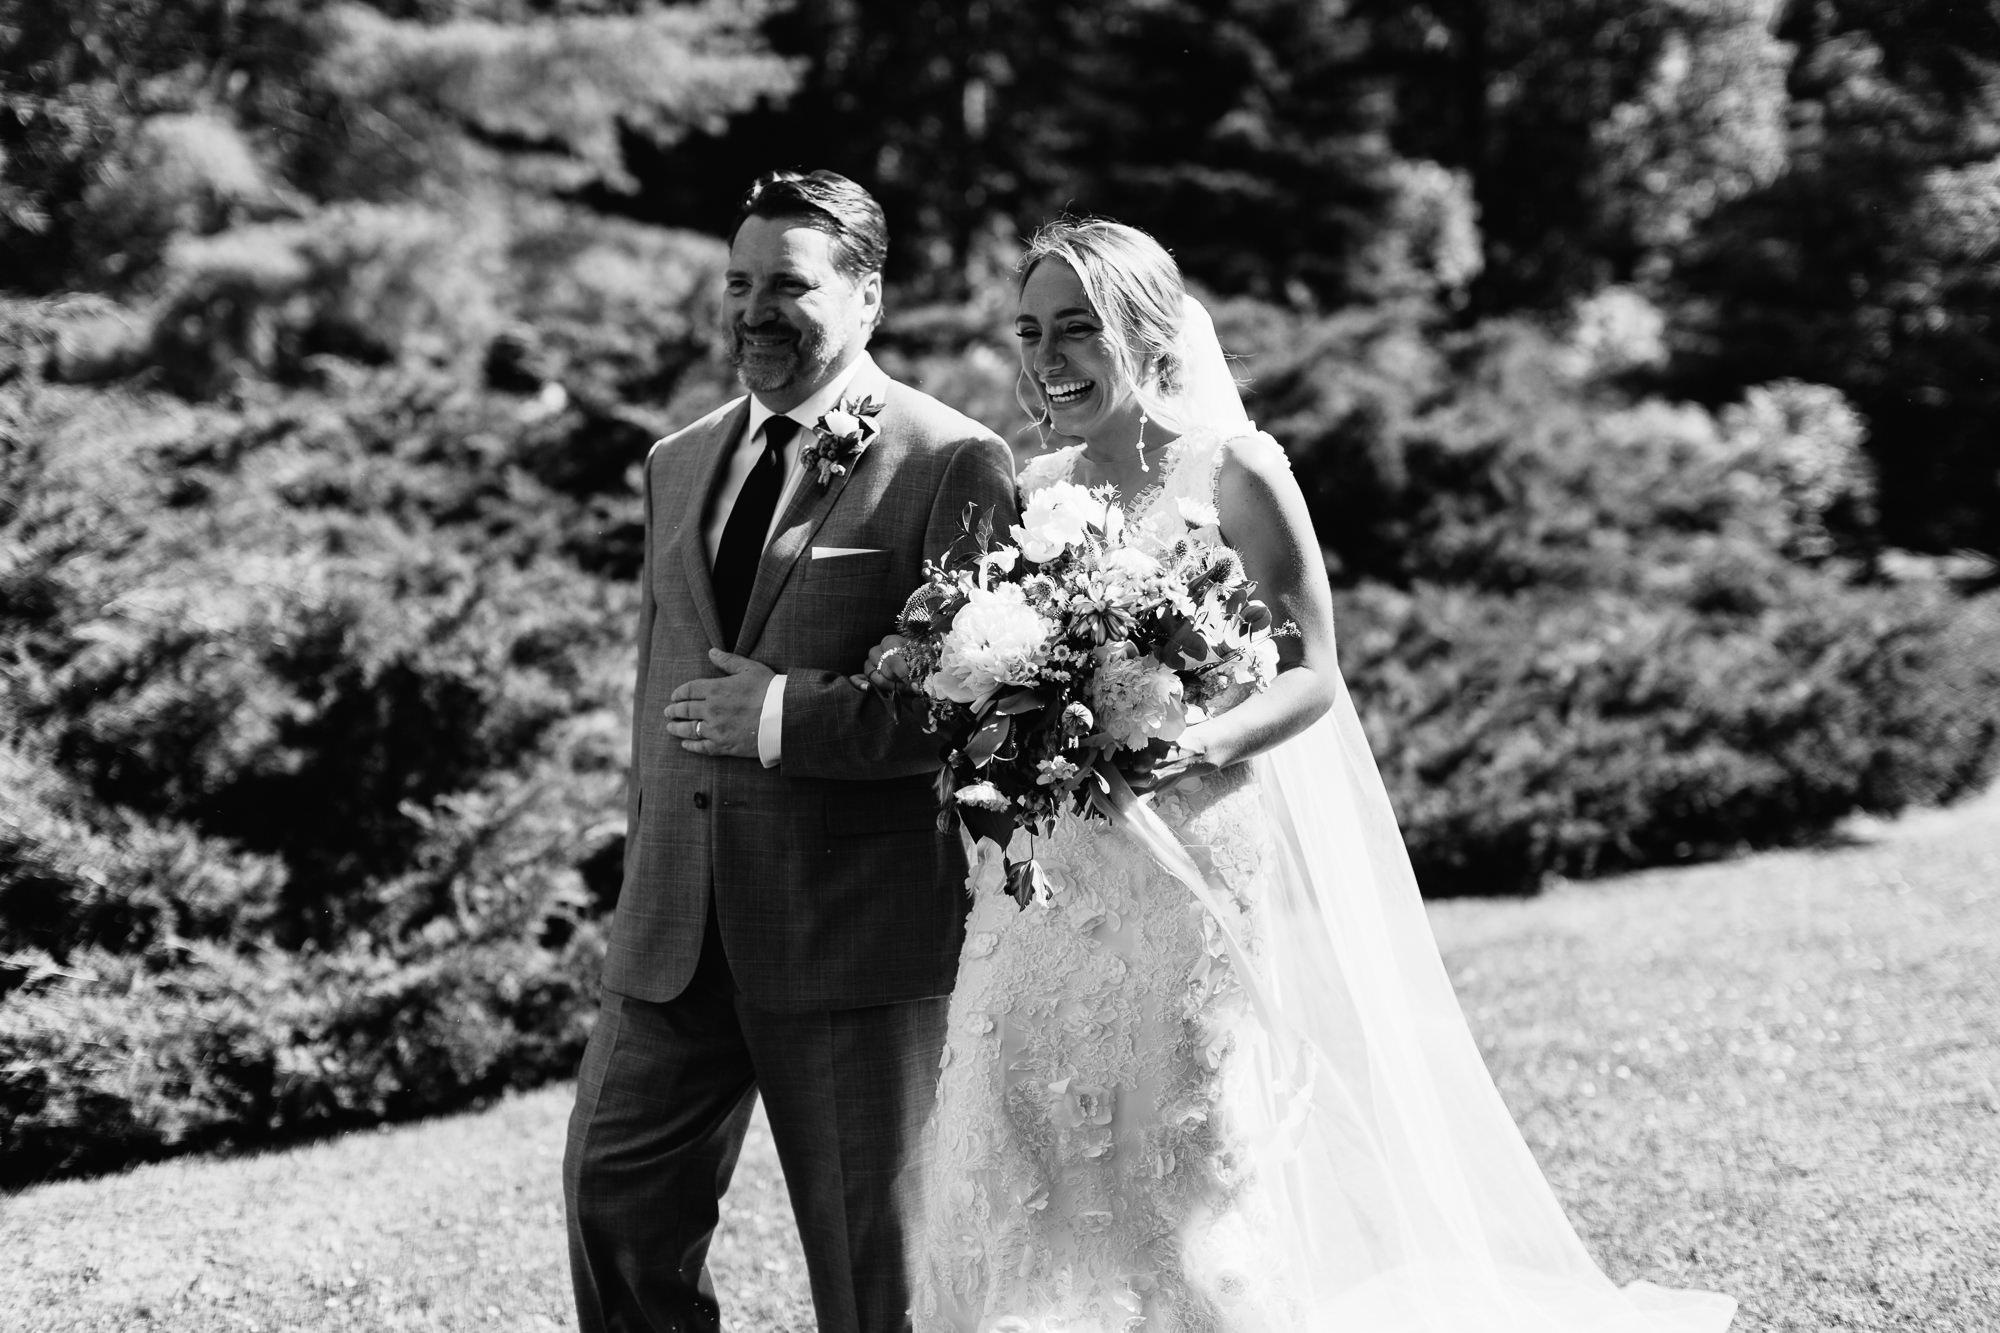 connecticut-summer-lake-wedding-emily-kirke-photography-upstyle (85 of 181).jpg